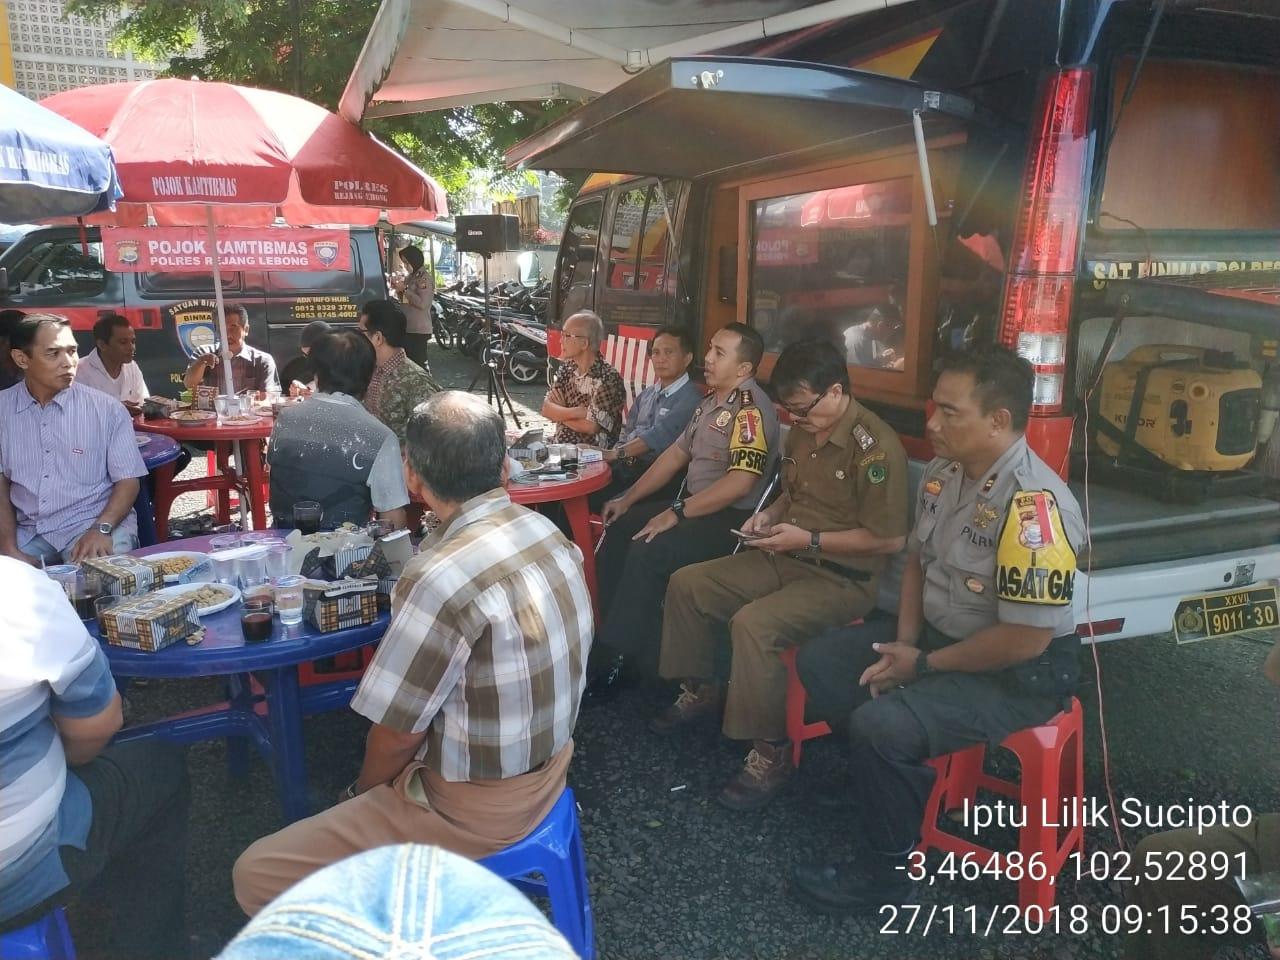 Coffe Morning Bersama Pedagang, Kapolres Rejang Lebong Ingatkan Pentingnya Koordinasi dan Pengadaan CCTV